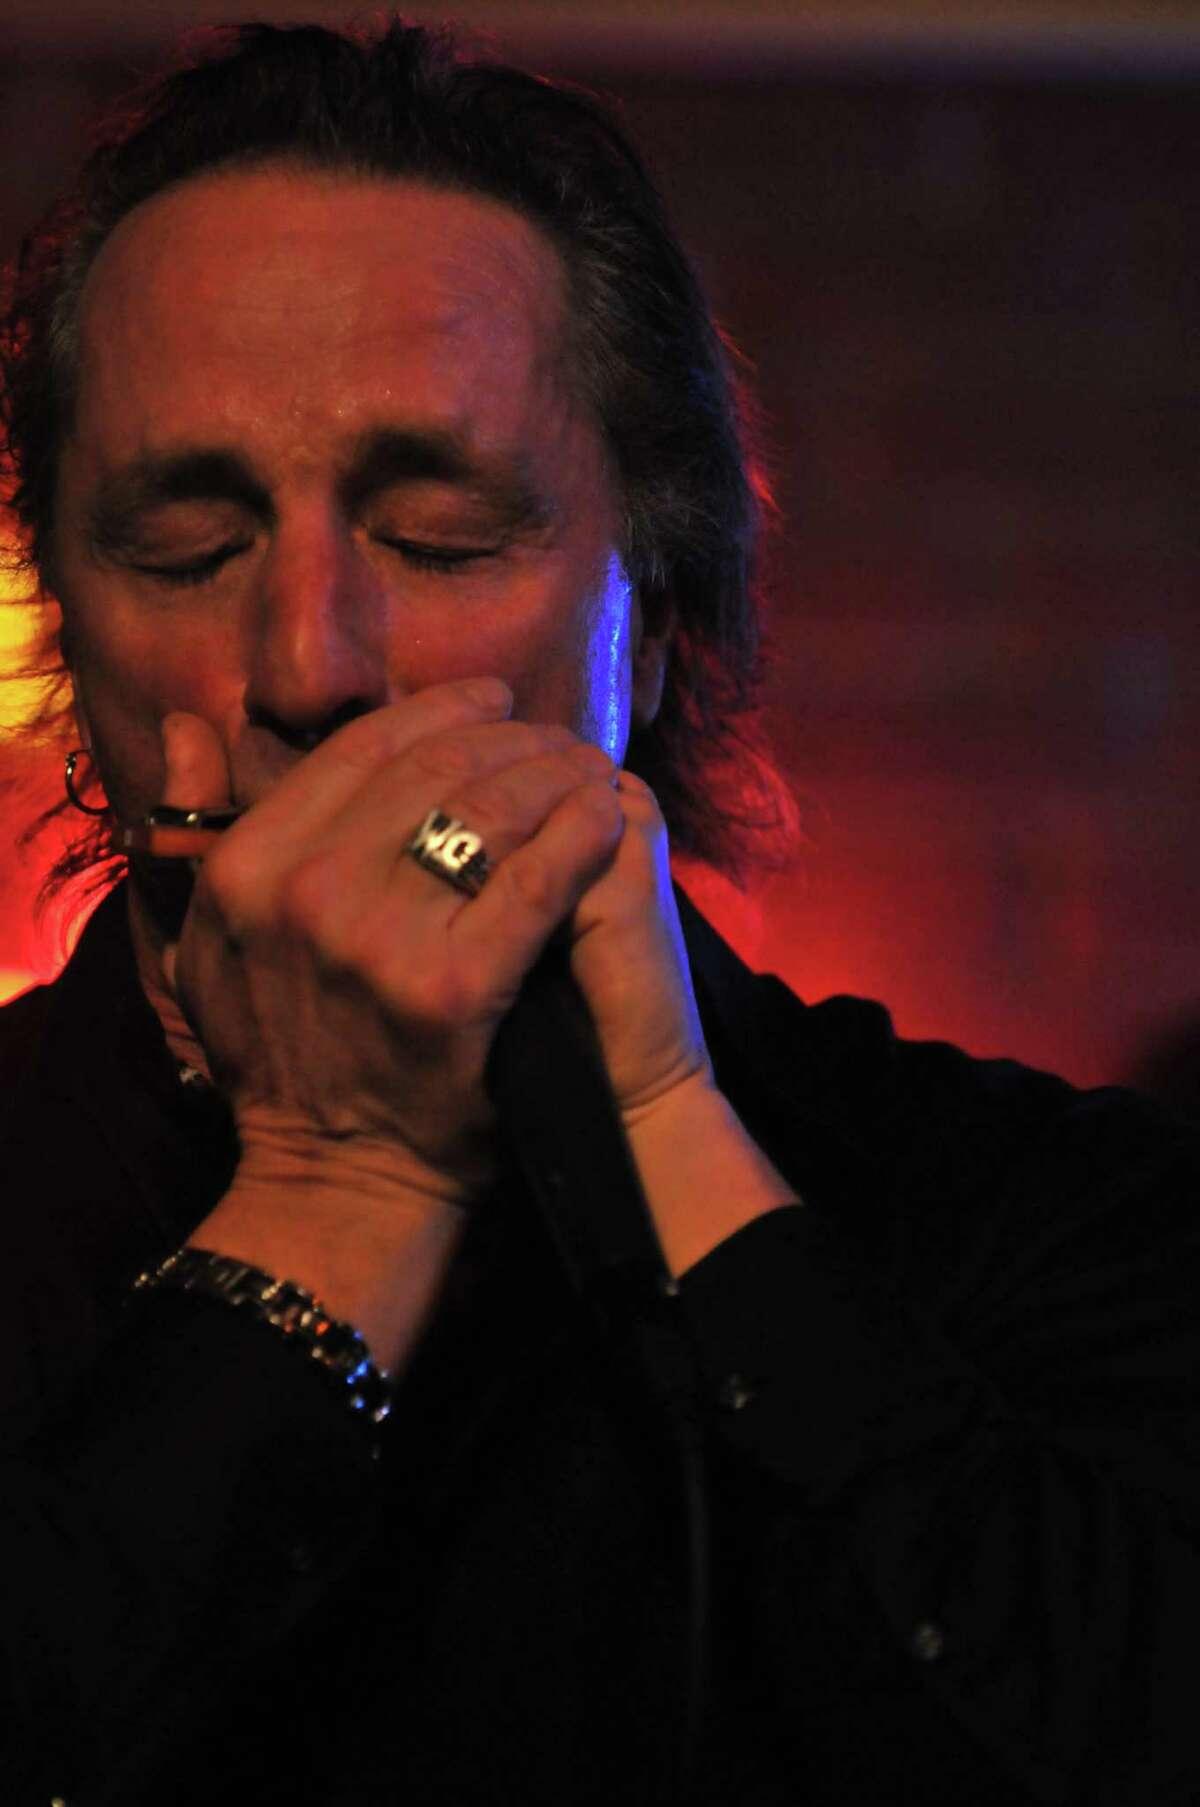 James Montgomery is performing at Bridge Street Live on Dec. 28.